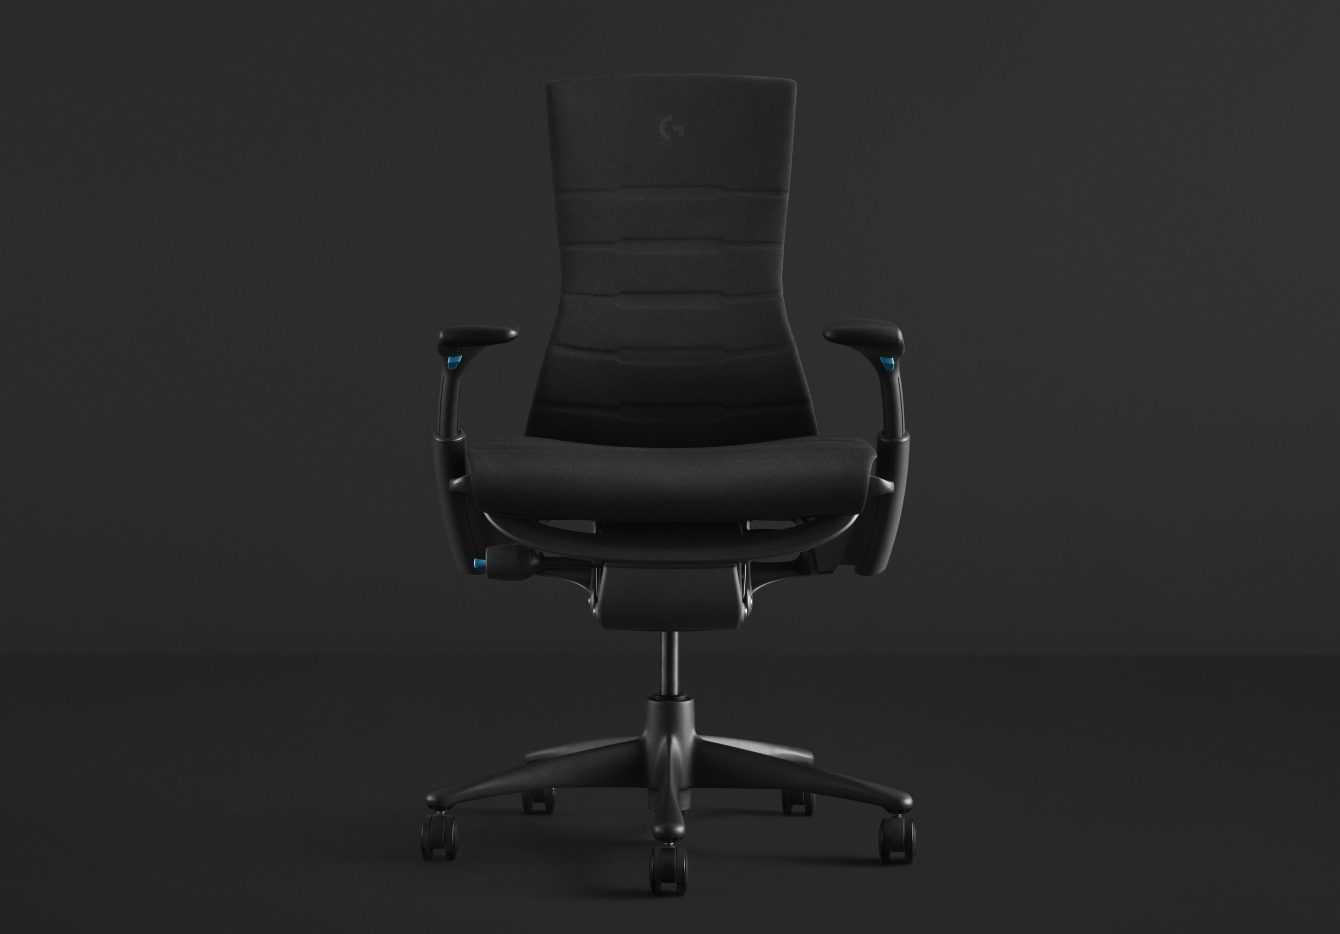 Logitech ed Herman Miller in collaborazione per nuove sedie e scrivanie da gaming